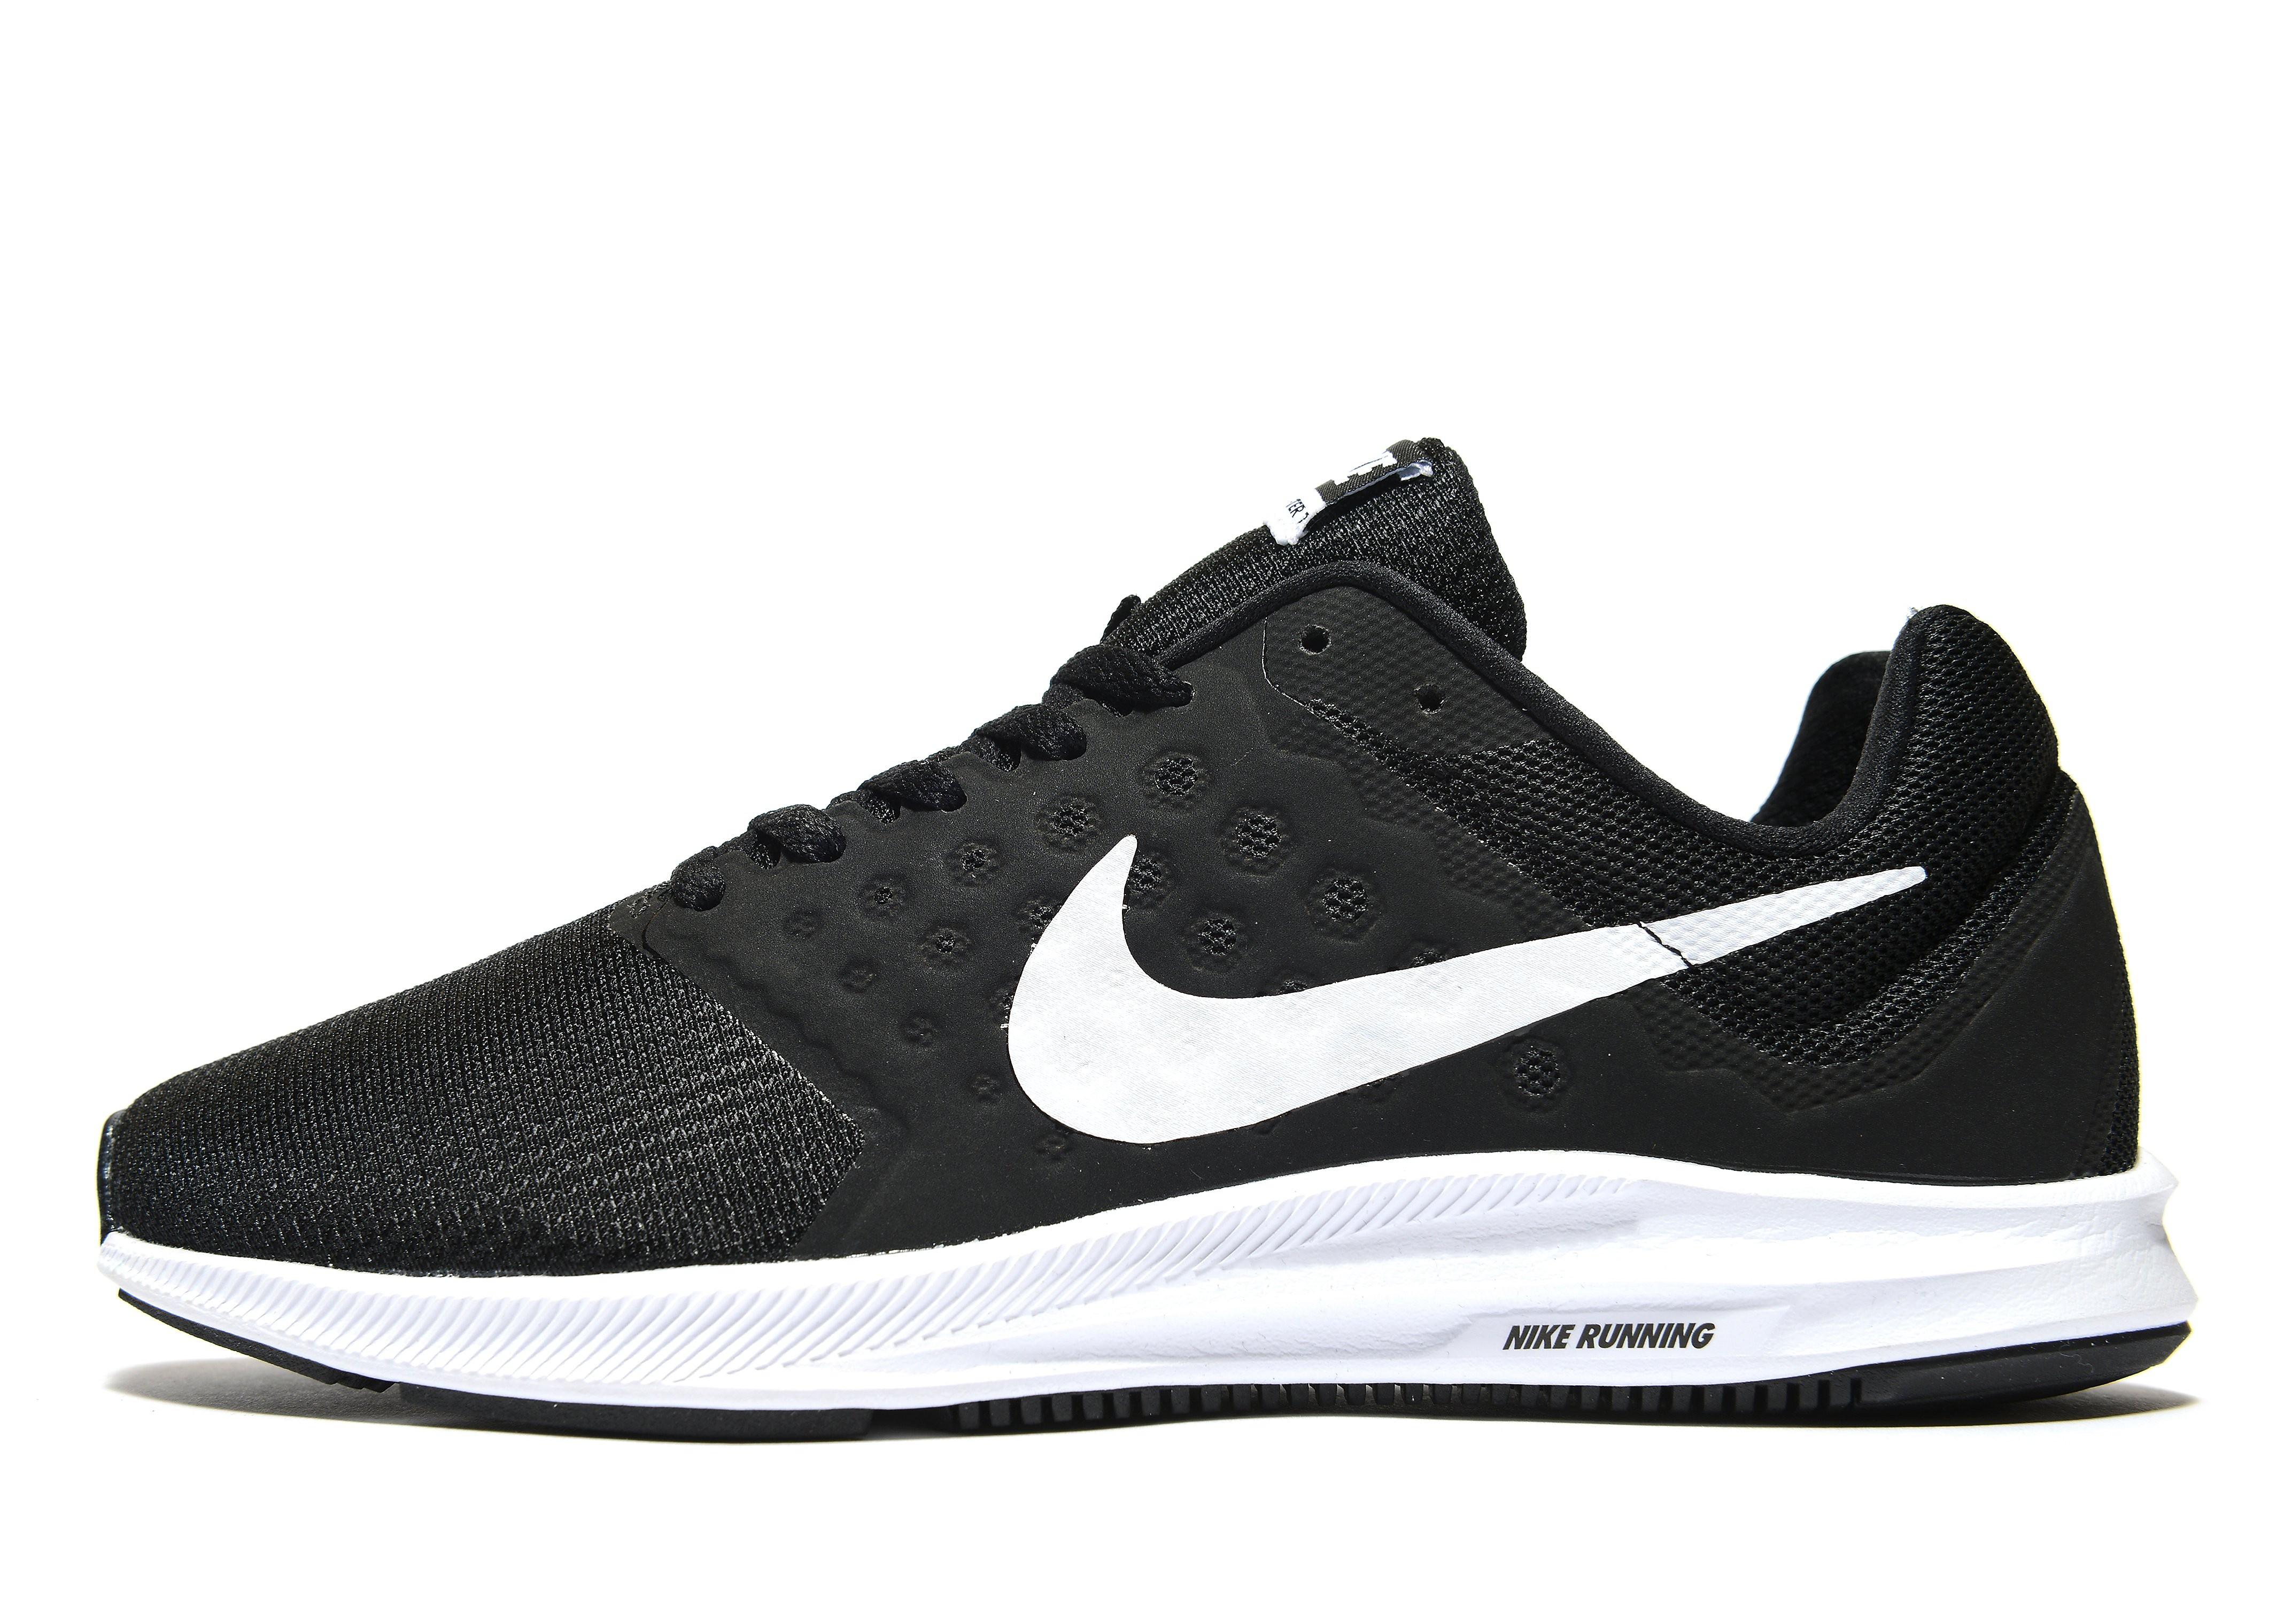 Nike Downshifter 7 Femme